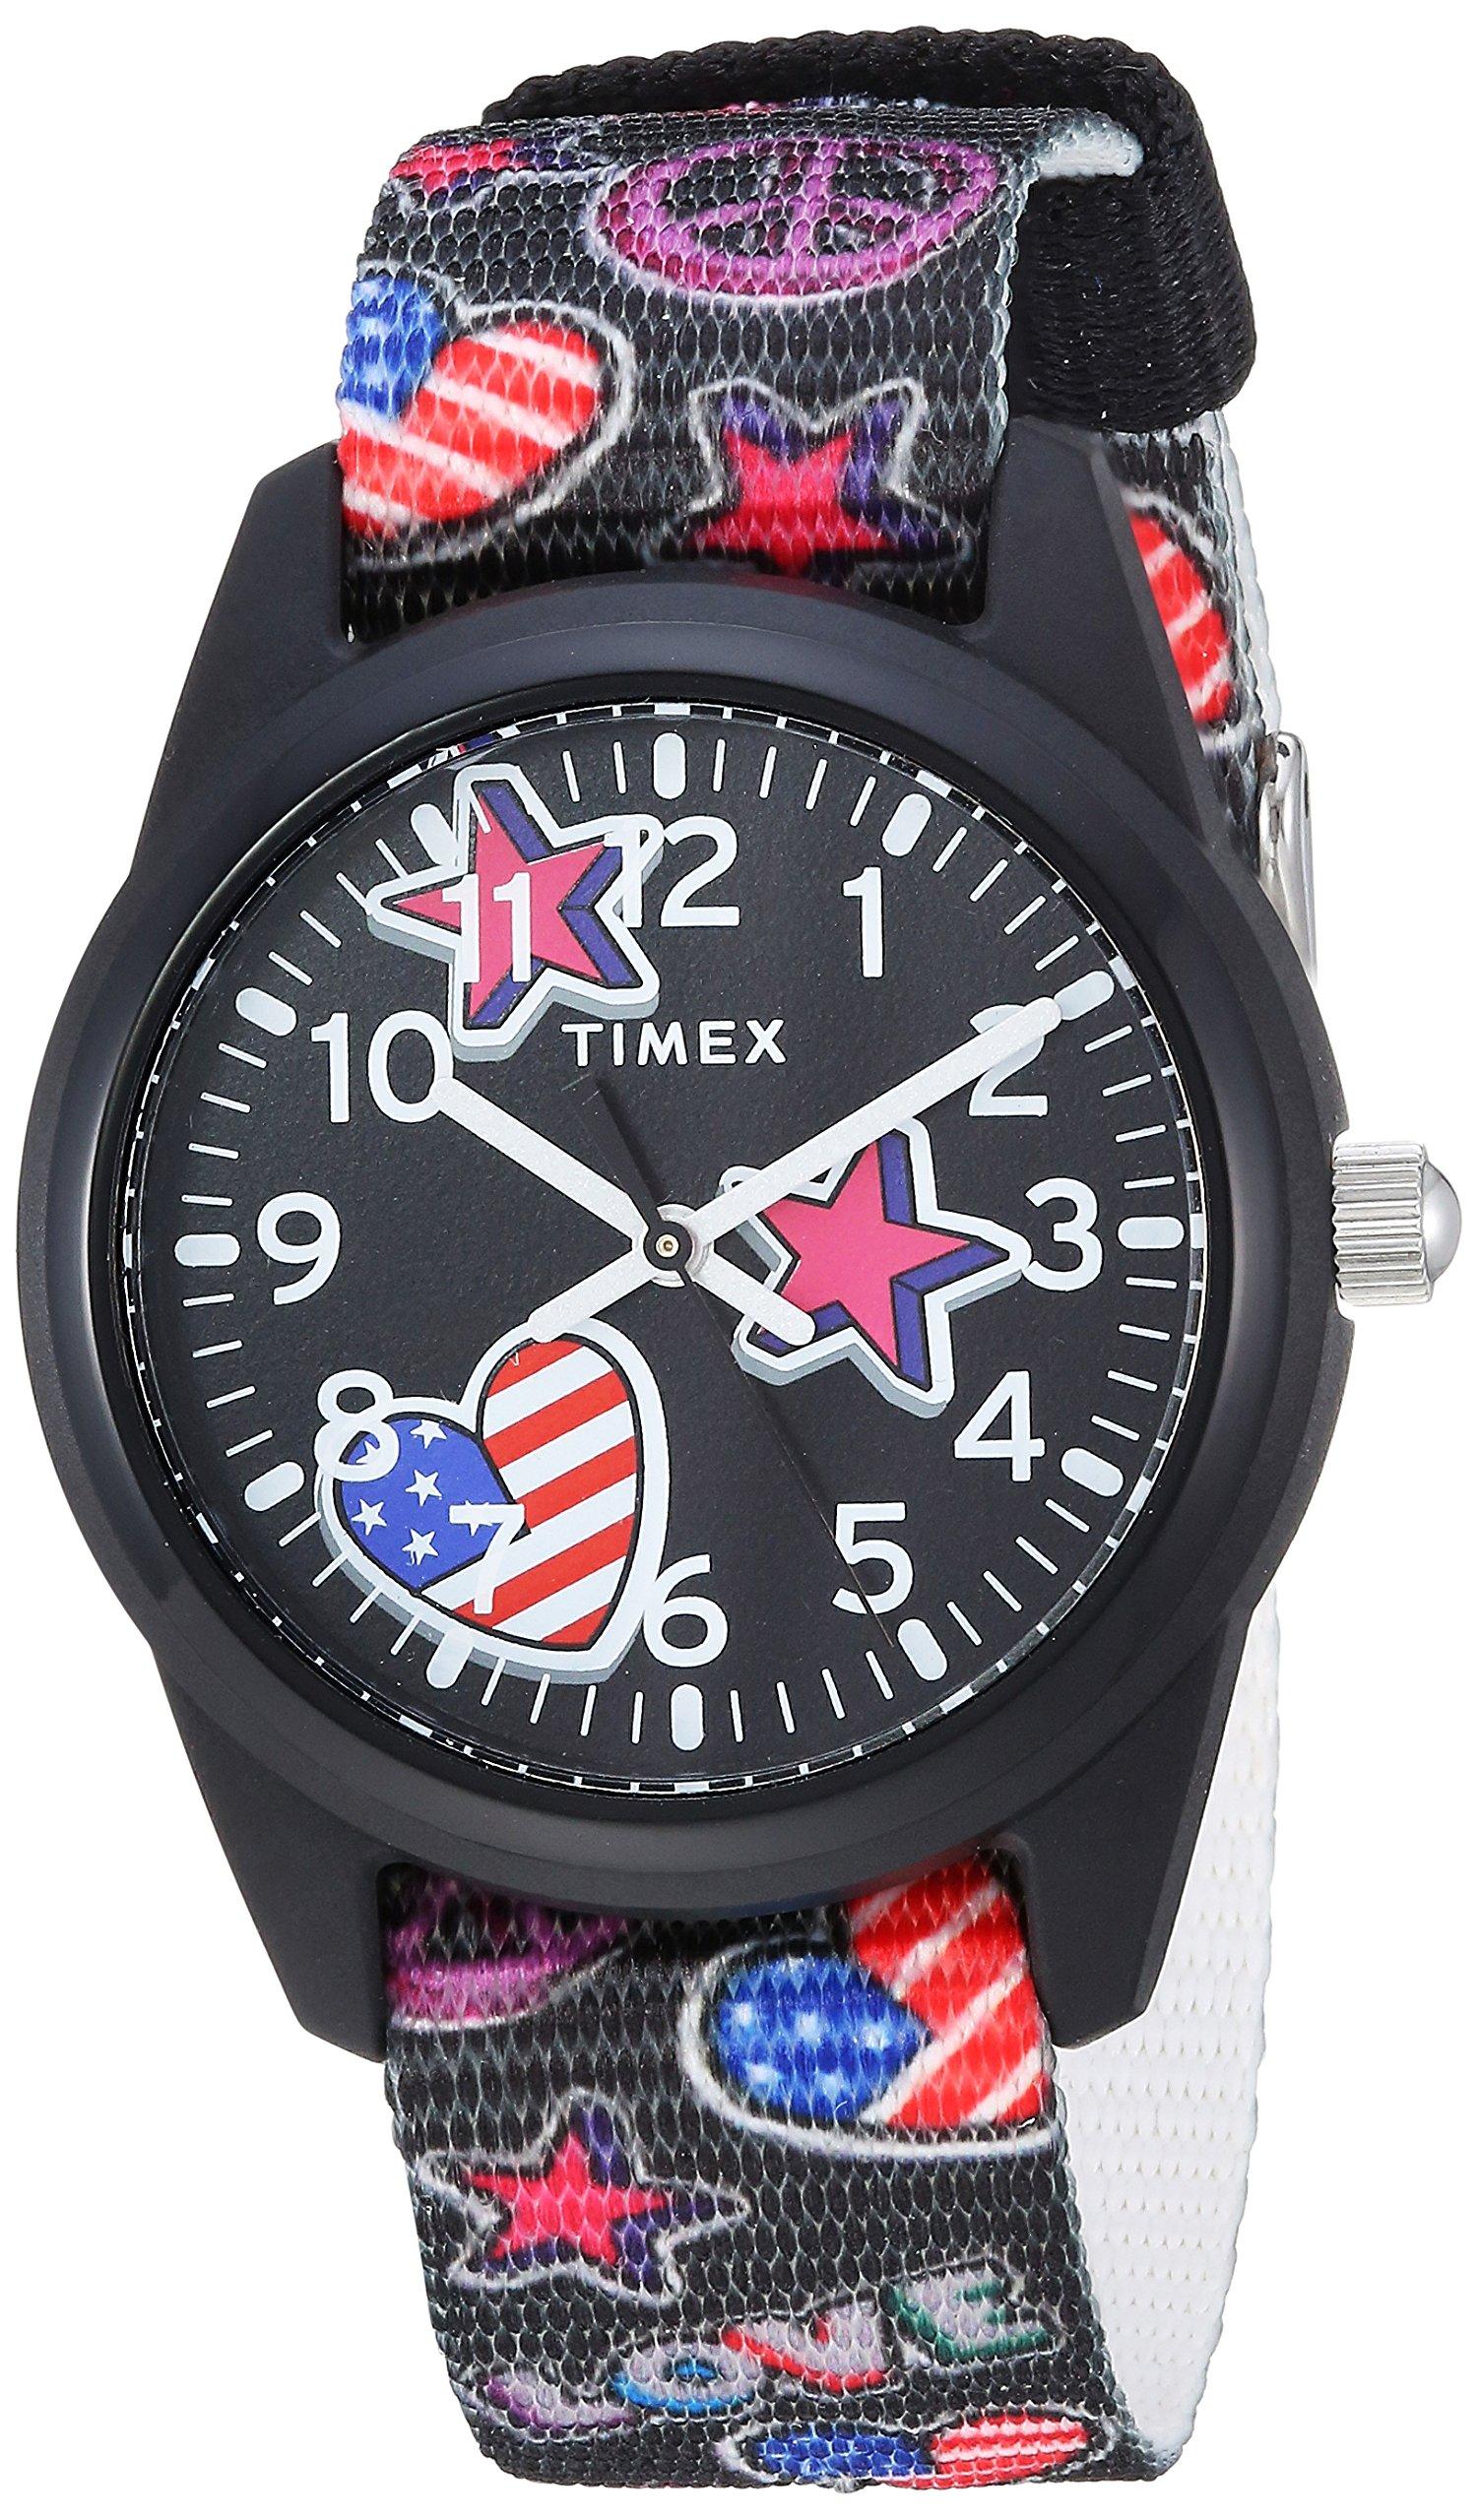 Timex Girls TW7C23700 Time Machines Black/Stars & Flags Nylon Strap Watch by Timex